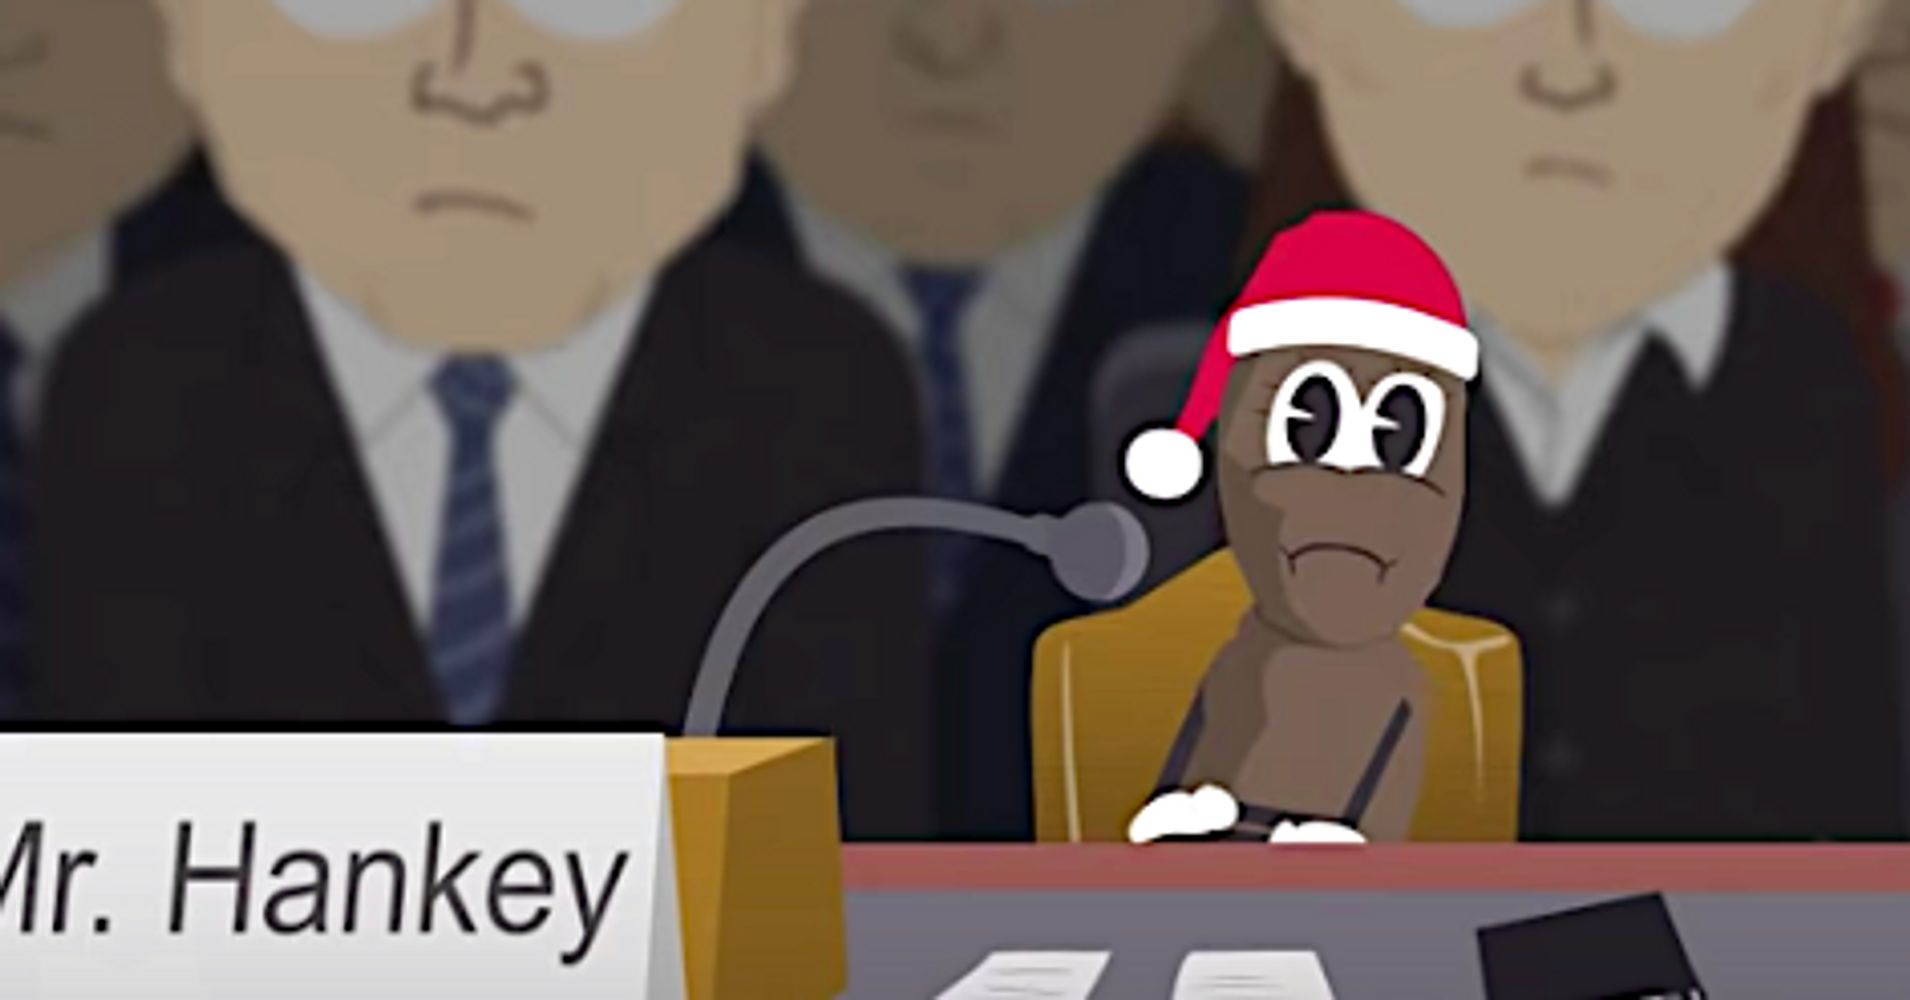 South Park\' Mocks Brett Kavanaugh With A Piece Of Poo | HuffPost